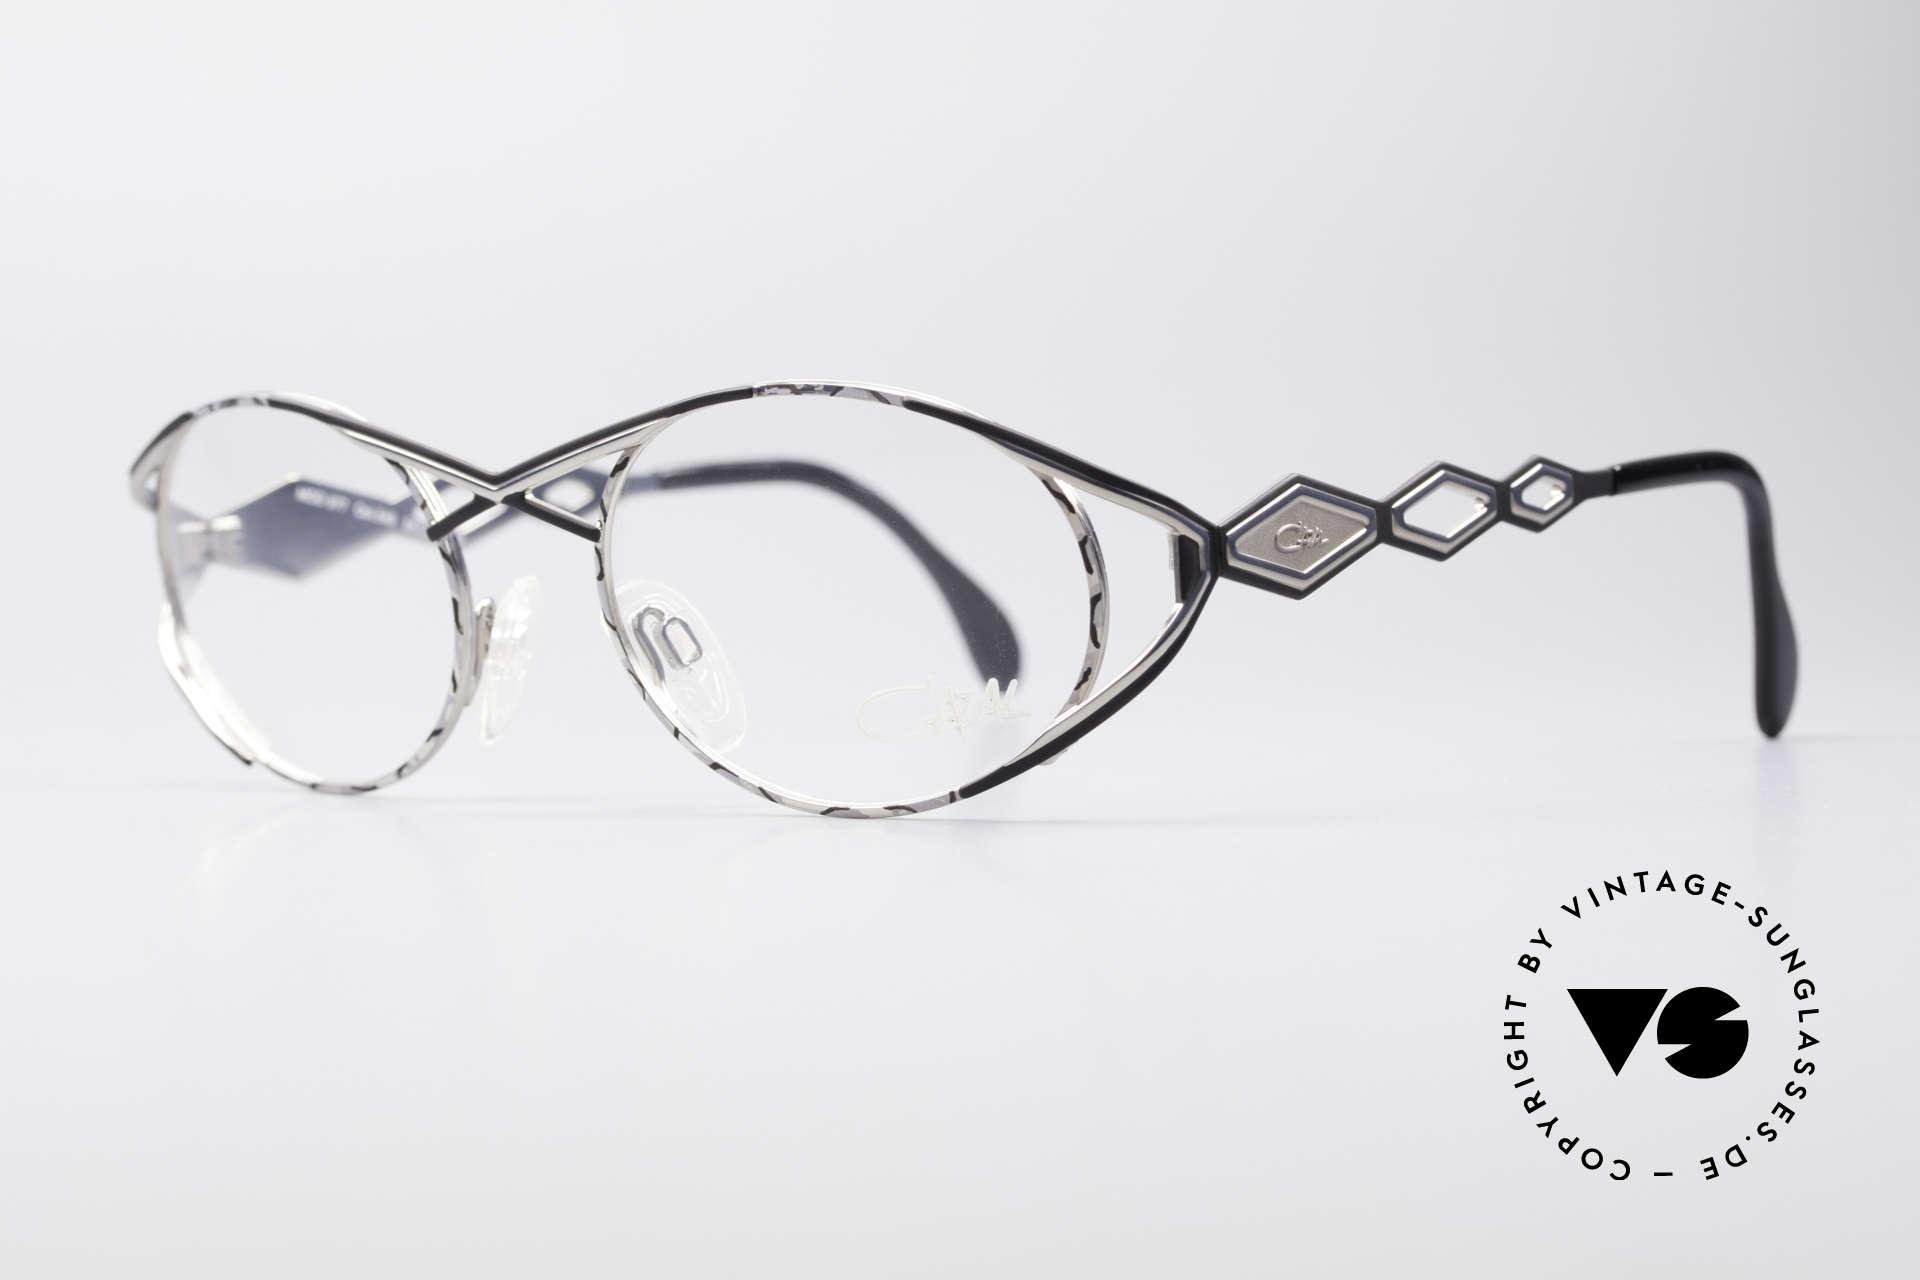 Cazal 977 Vintage 90s Eyeglasses Ladies, glamorous design elements; an elegance full of verve, Made for Women